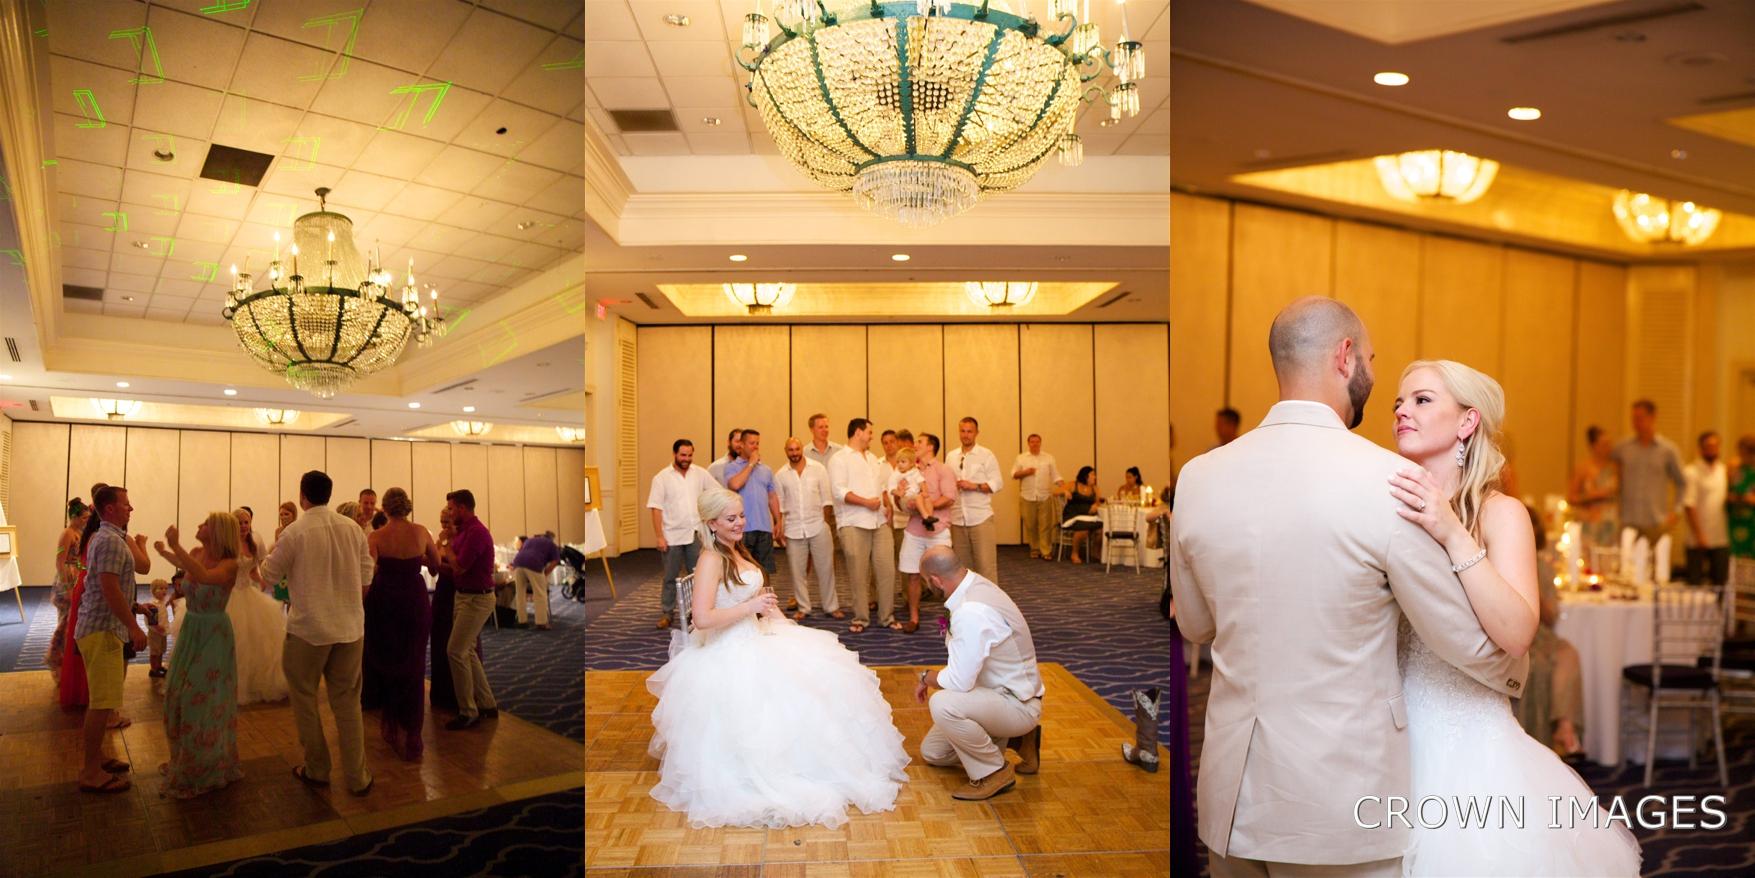 wedding_st_thomas_crown_images_0139.jpg